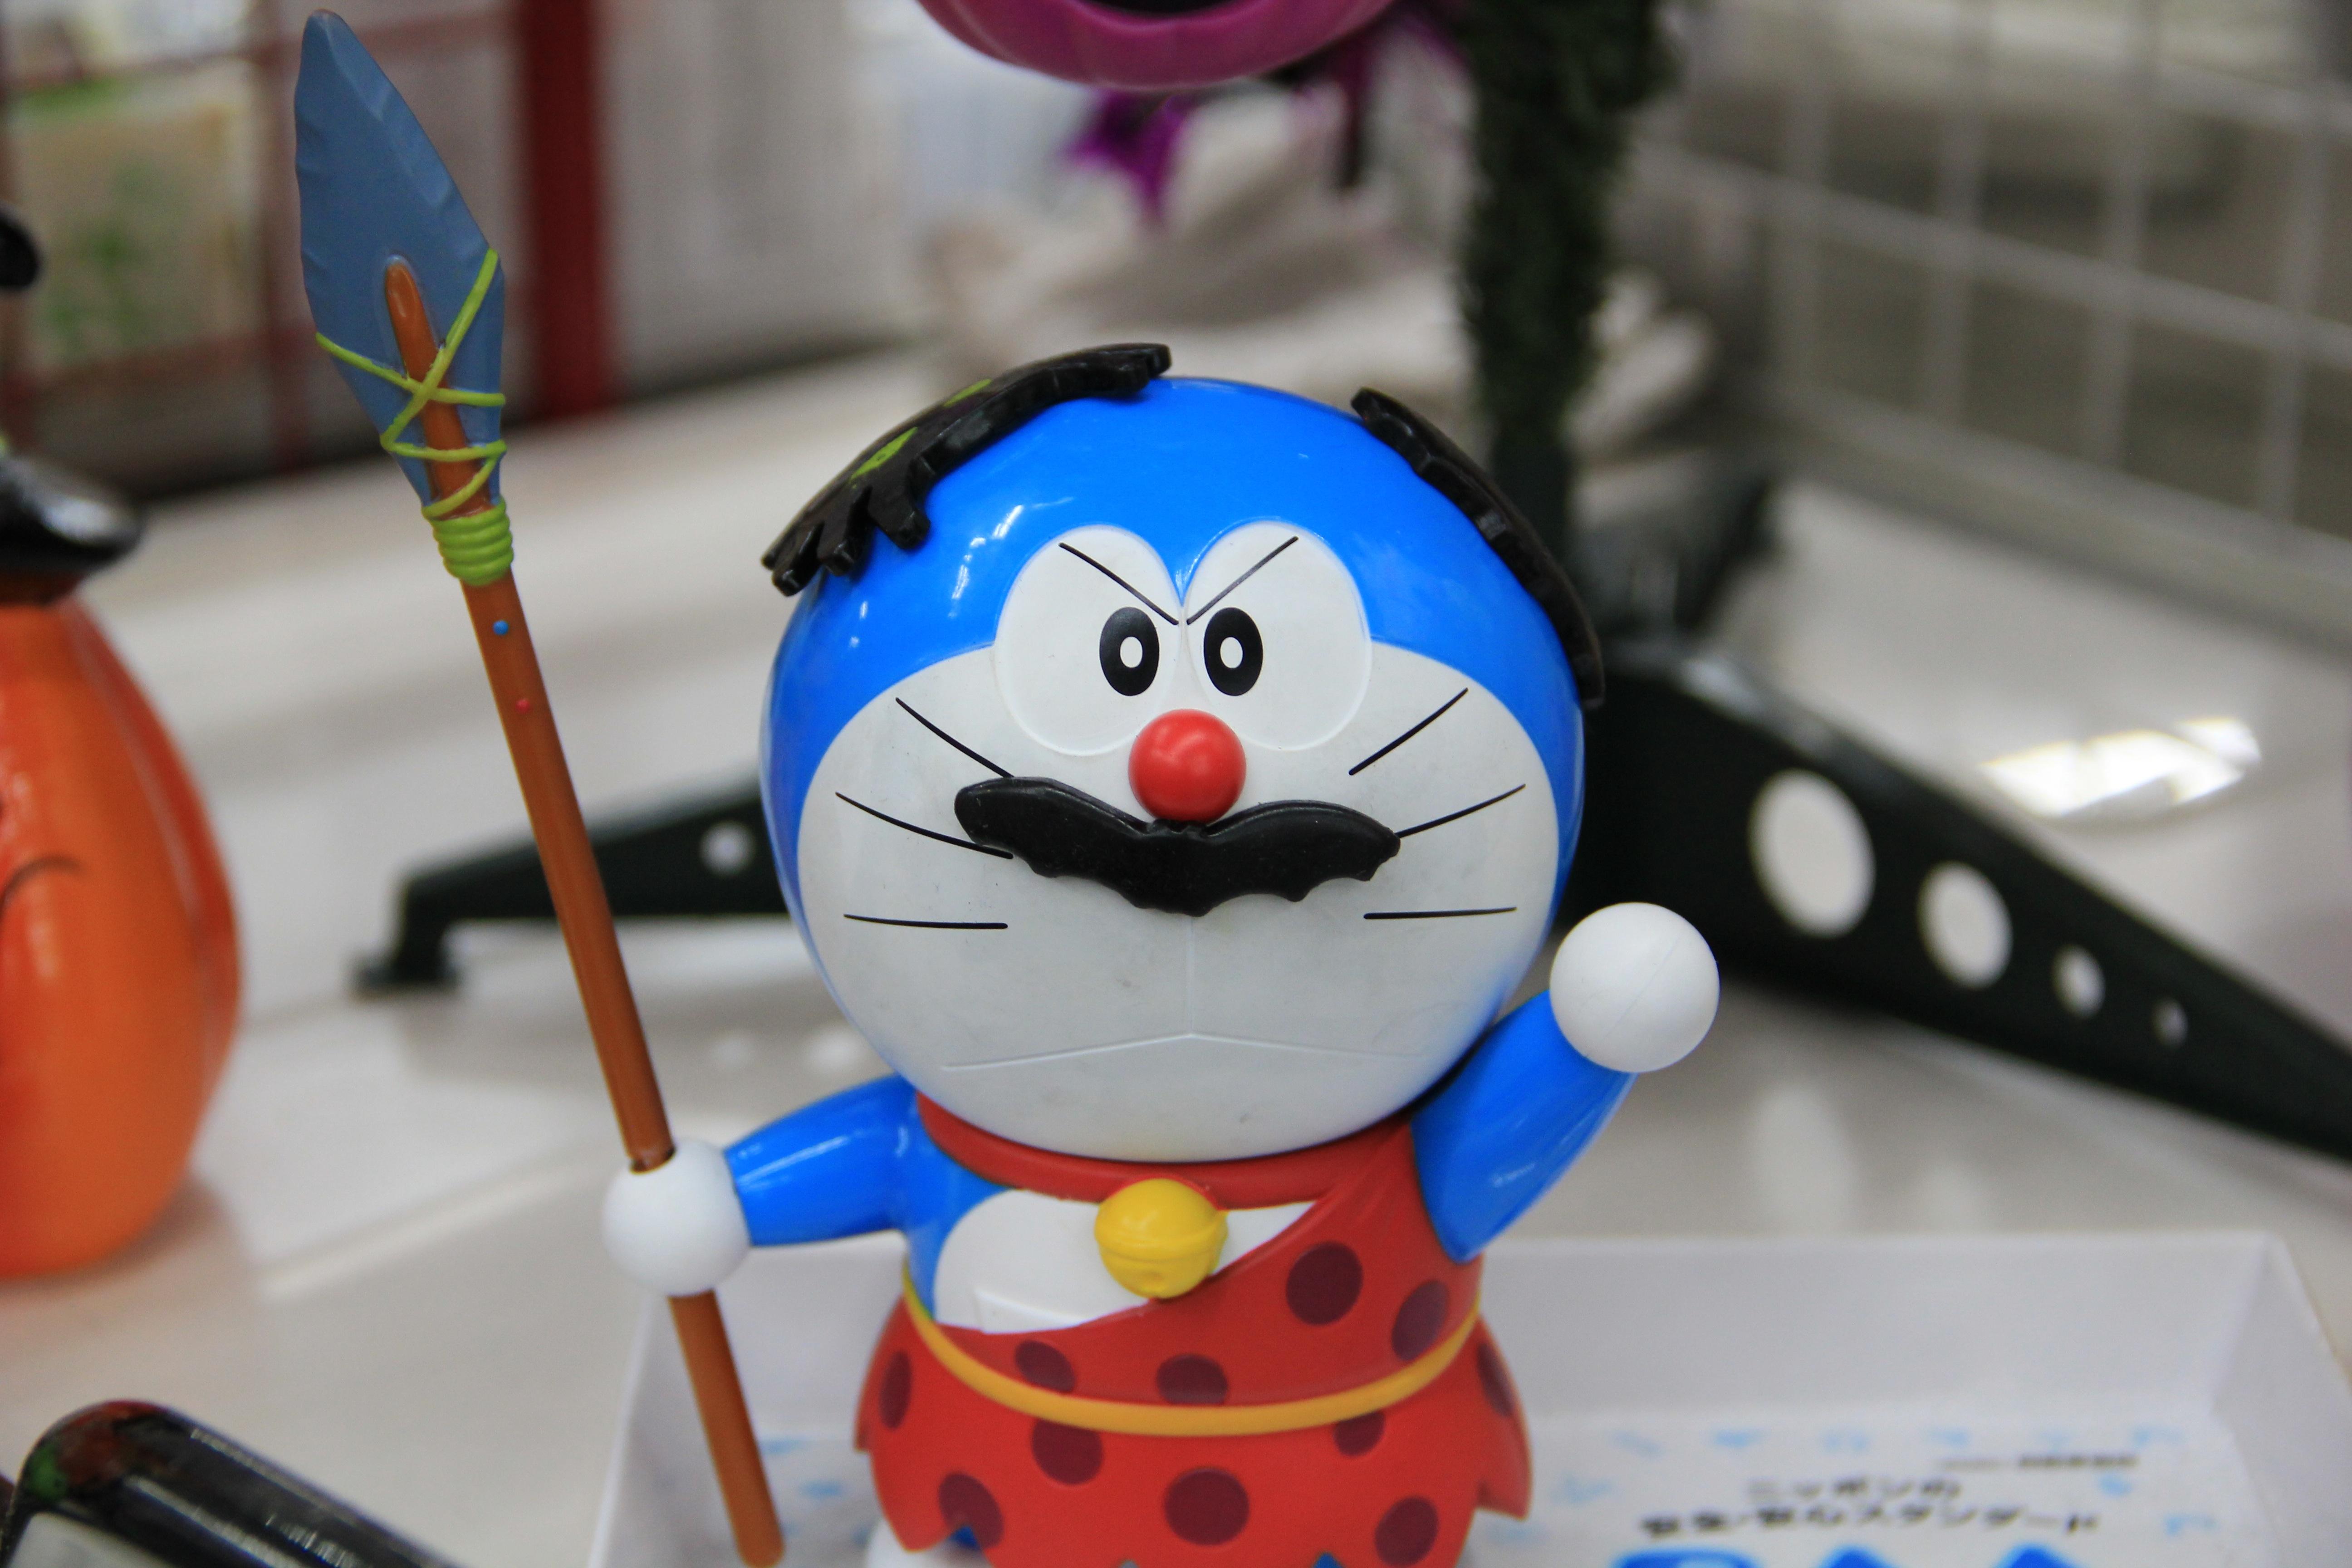 Blue Toy Anime Manga Doraemon Character Robotic Cat Stuffed